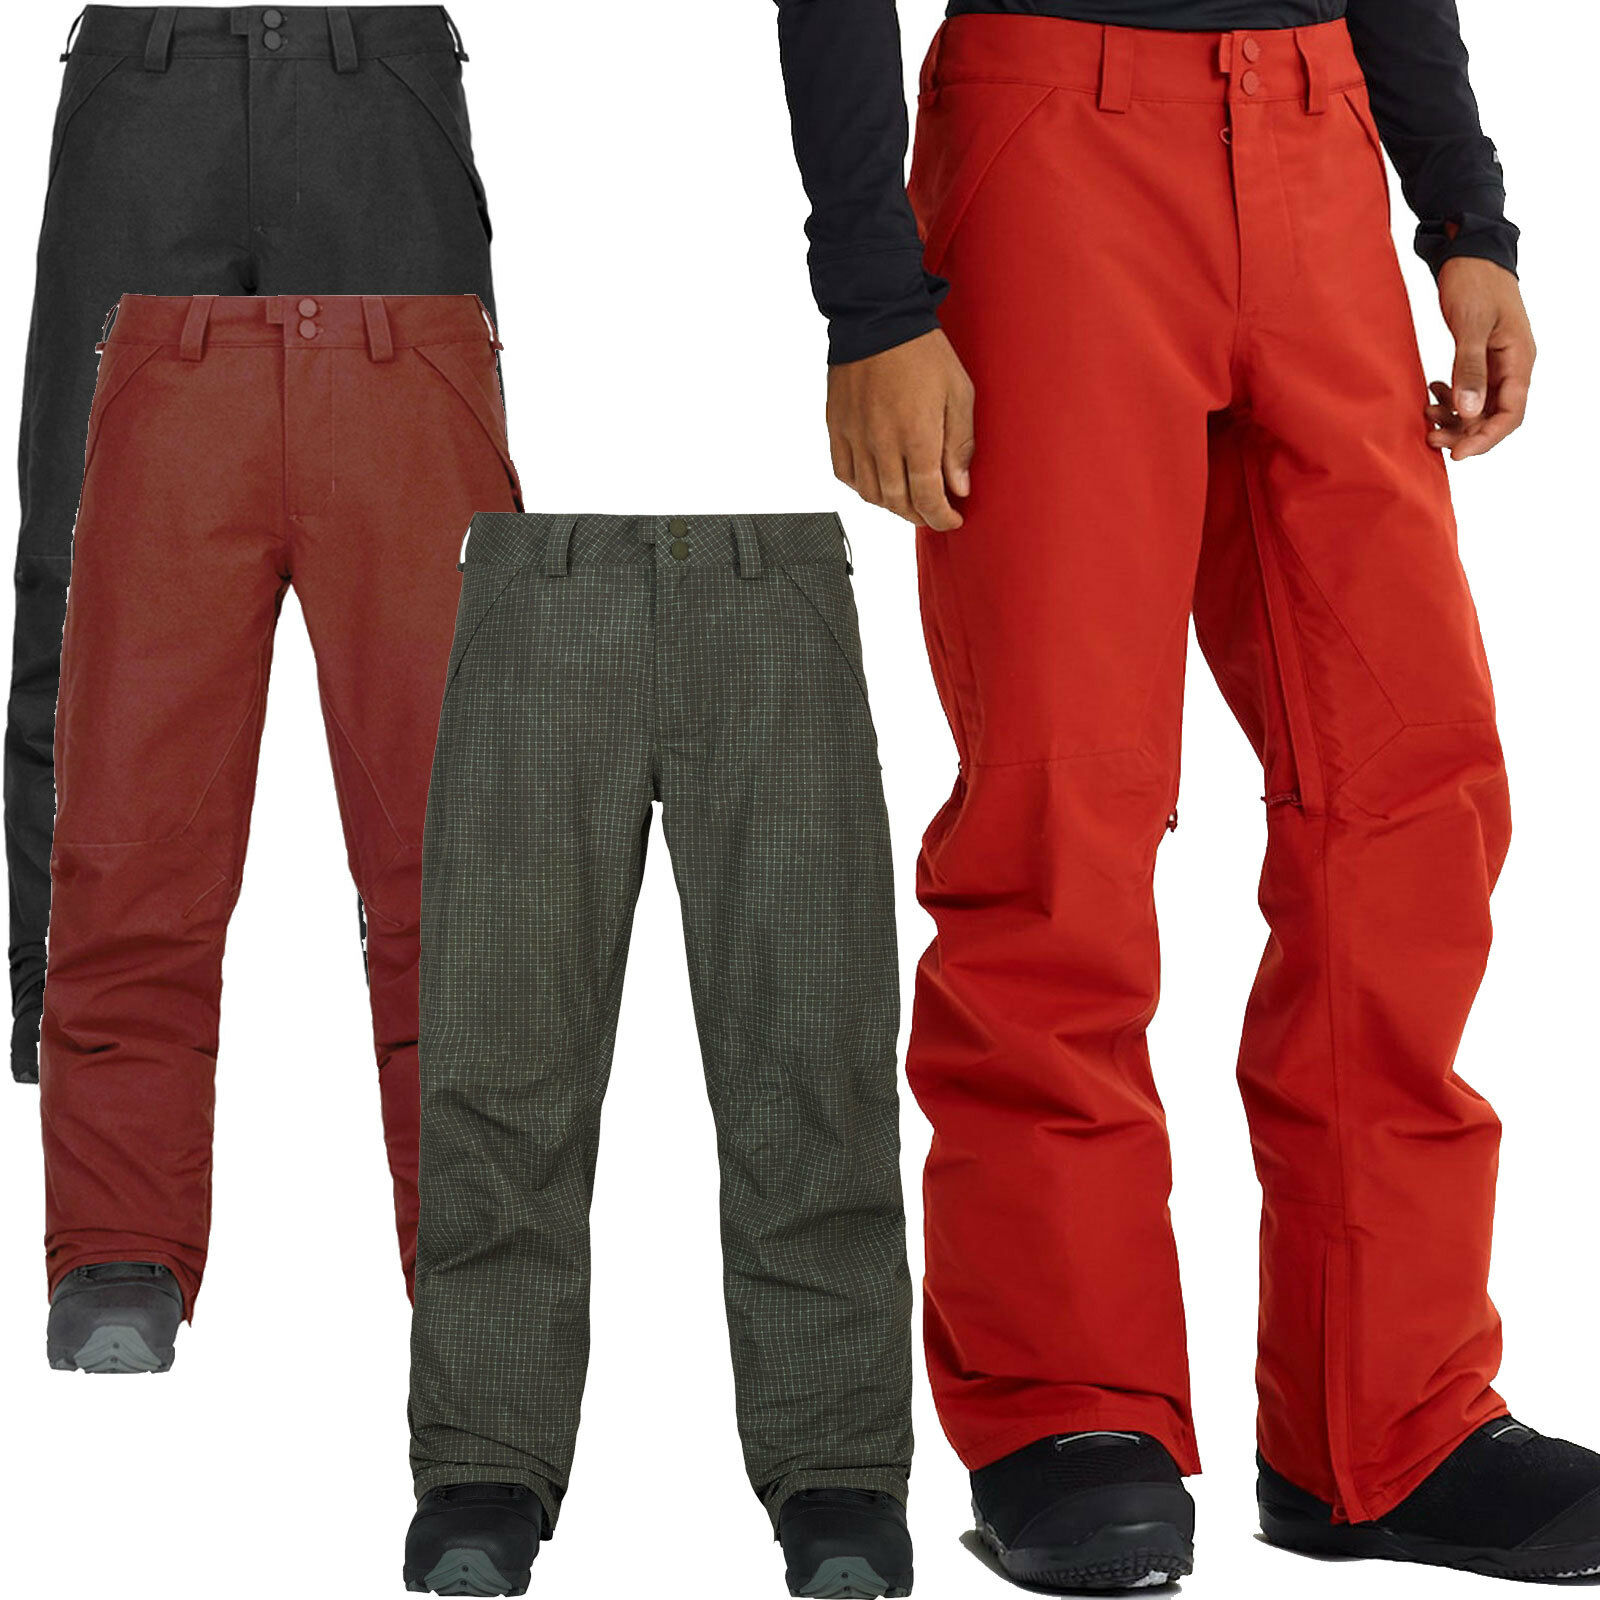 Burton Vent Pant Men's Snowboard Pants Ski  Pants Functional Pants  low 40% price